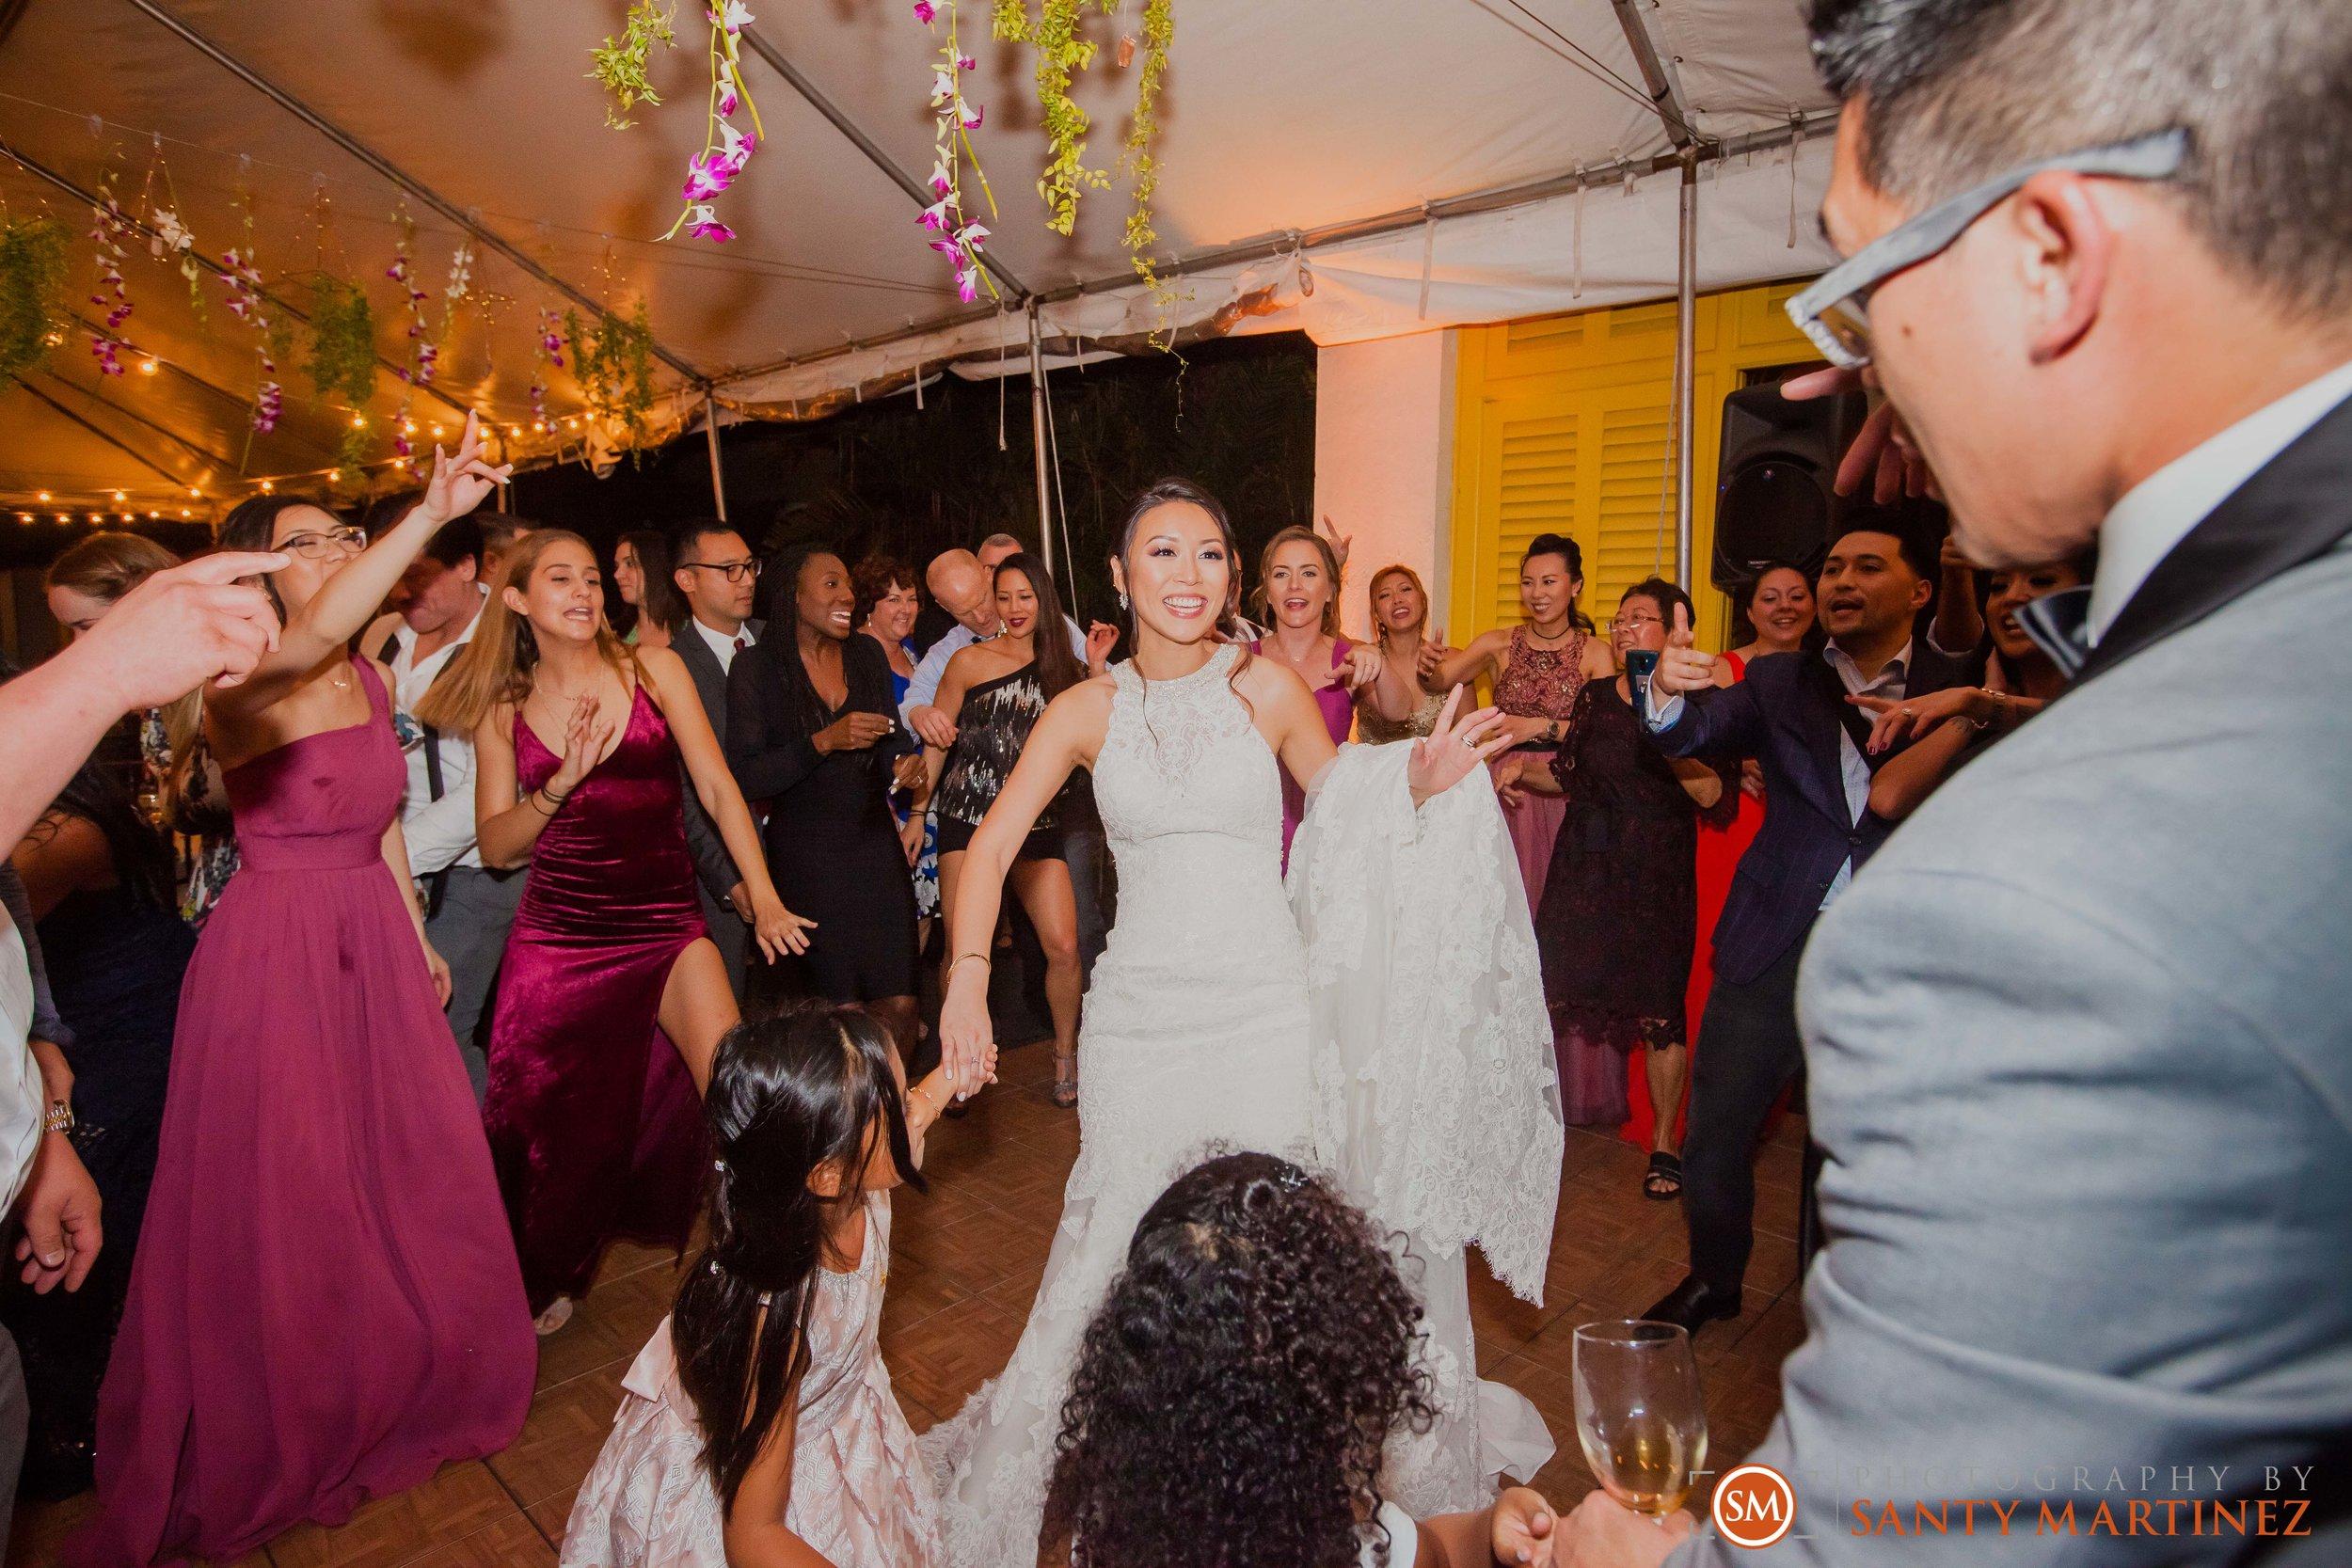 Wedding Bonnet House - Photography by Santy Martinez-46.jpg